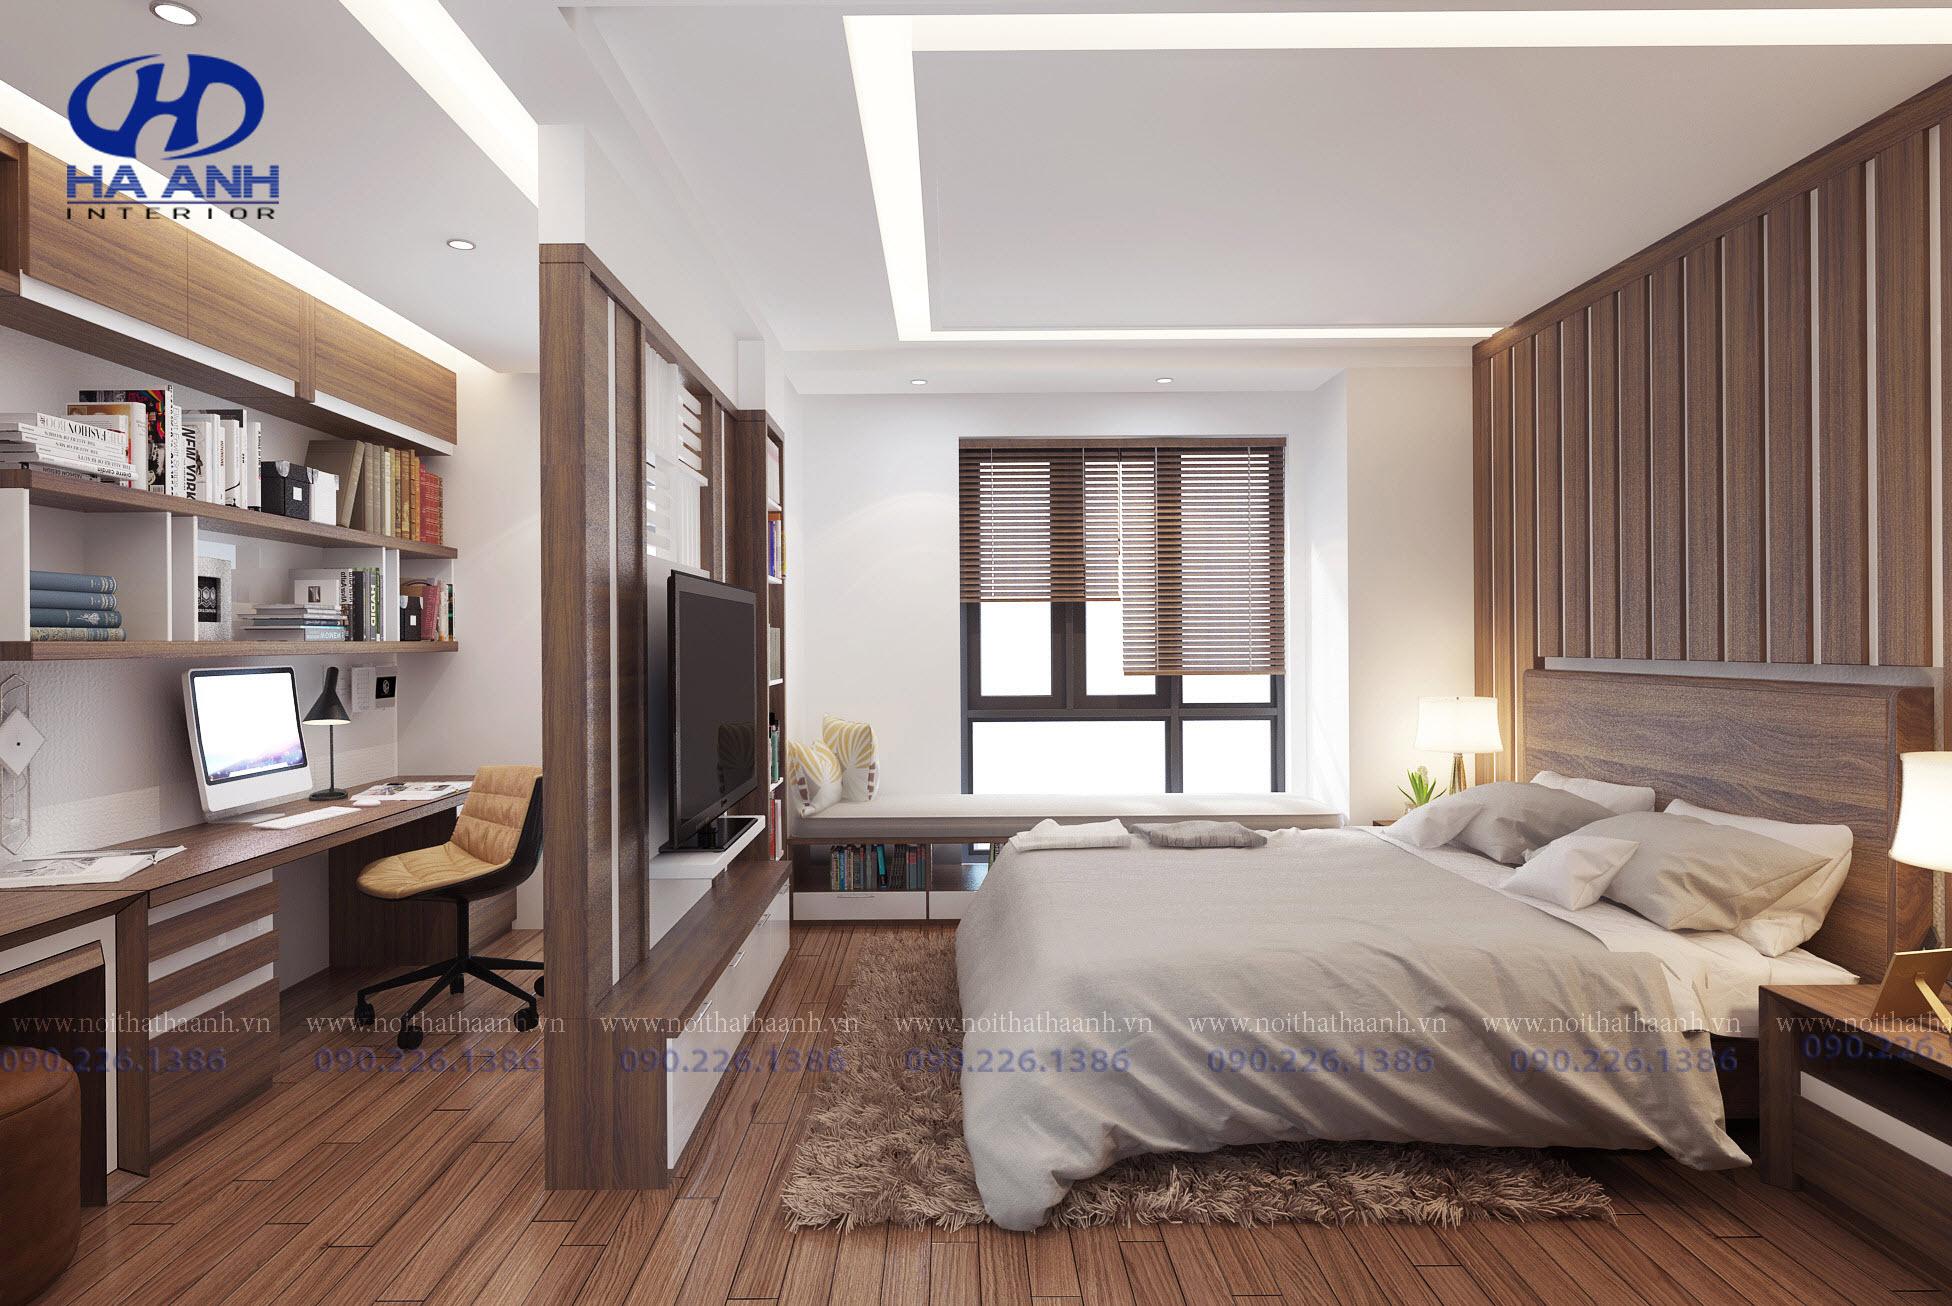 Phòng ngủ laminate HA-8020-2